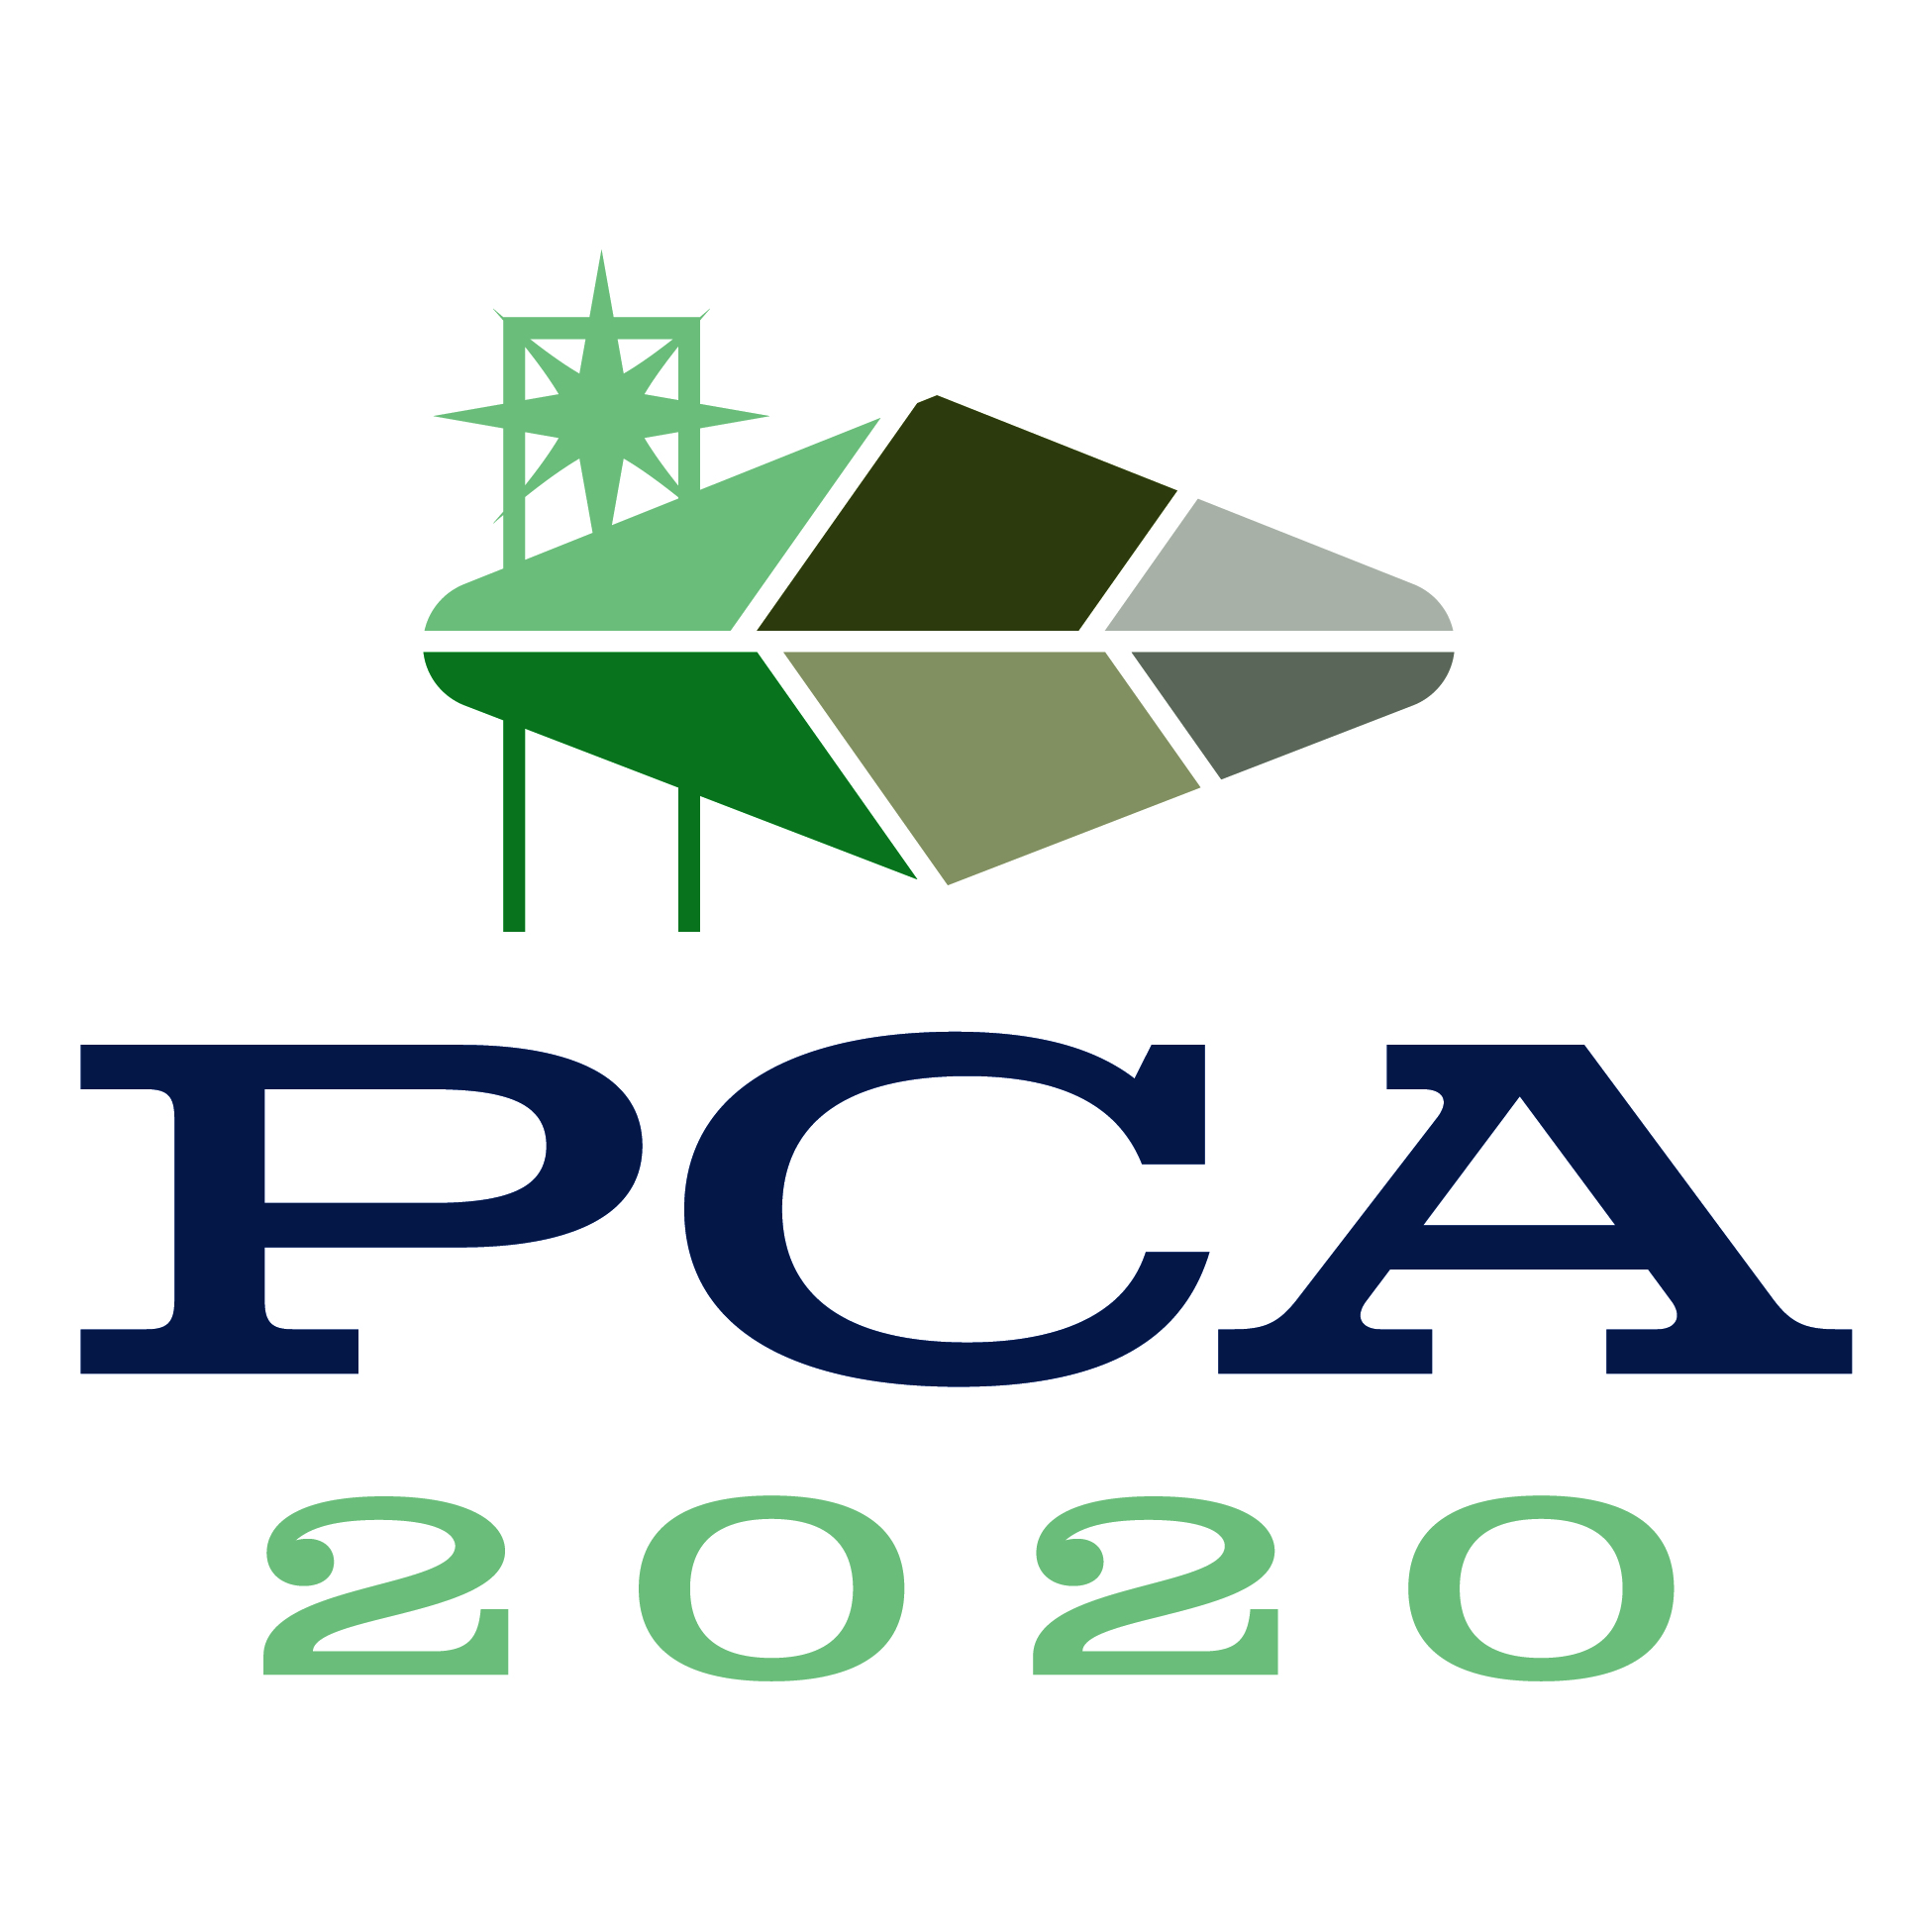 Pca 2020